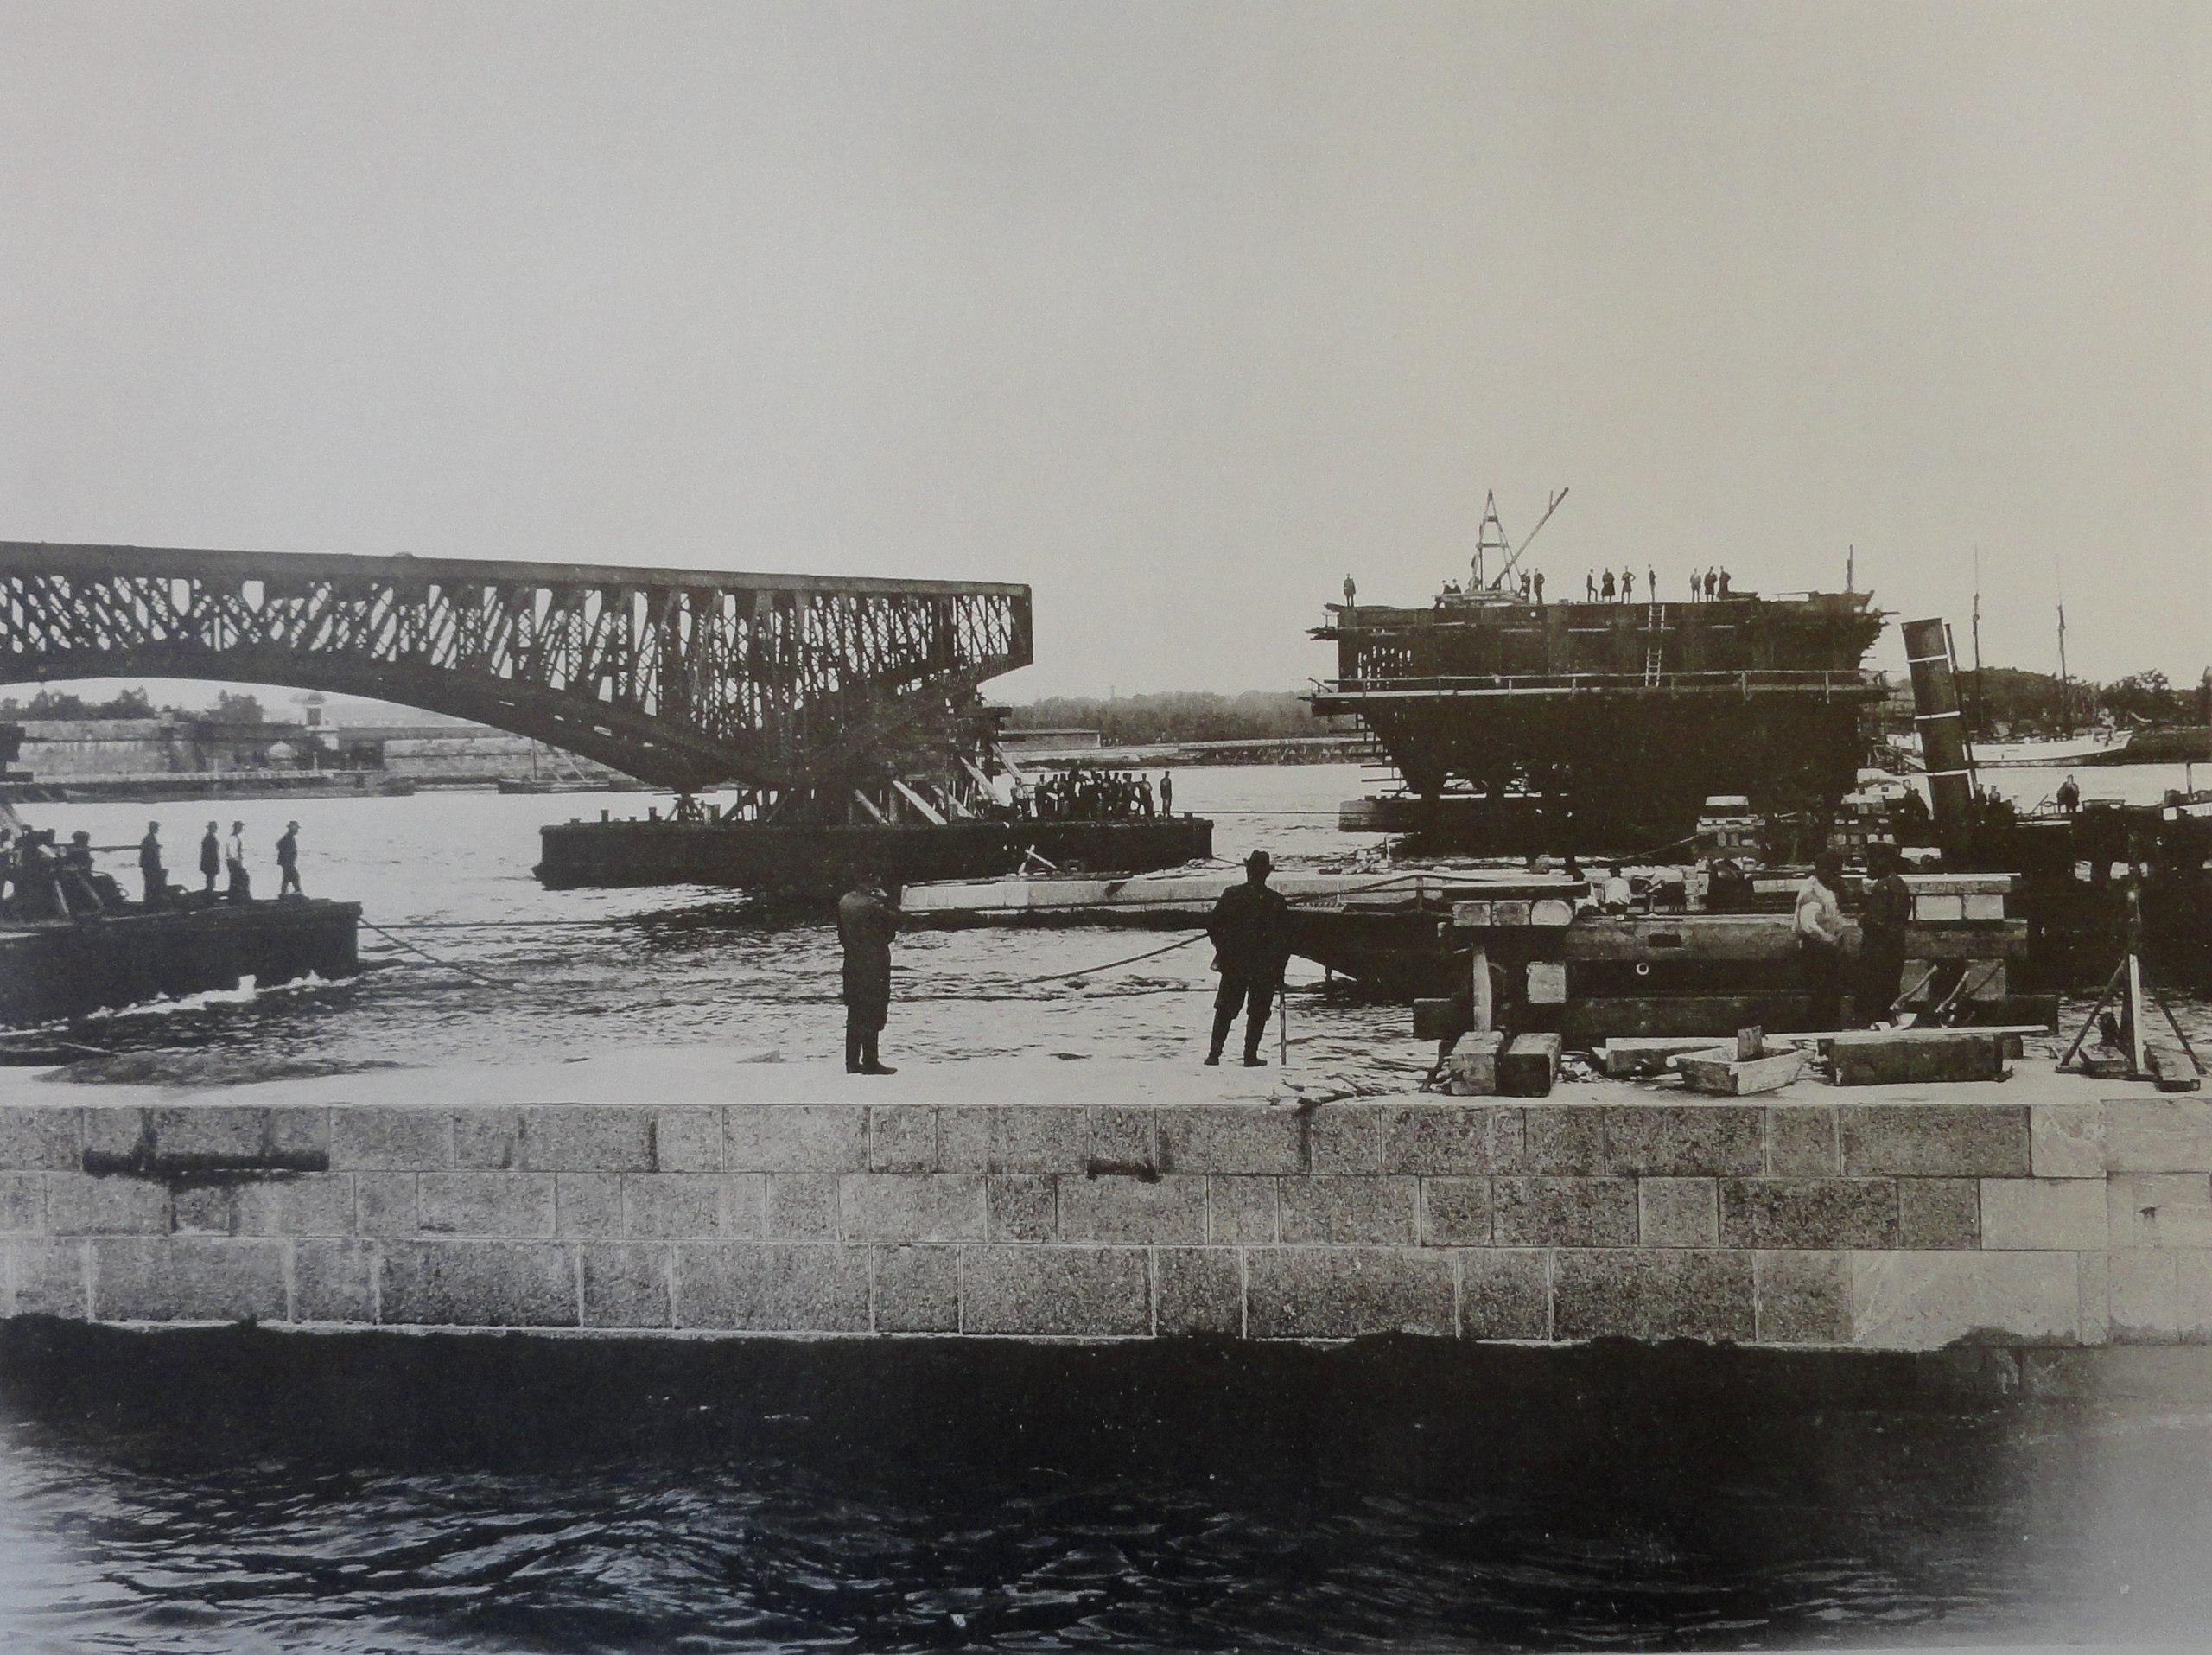 1901. Перевозка ферм левого крайнего пролета. 7 июня